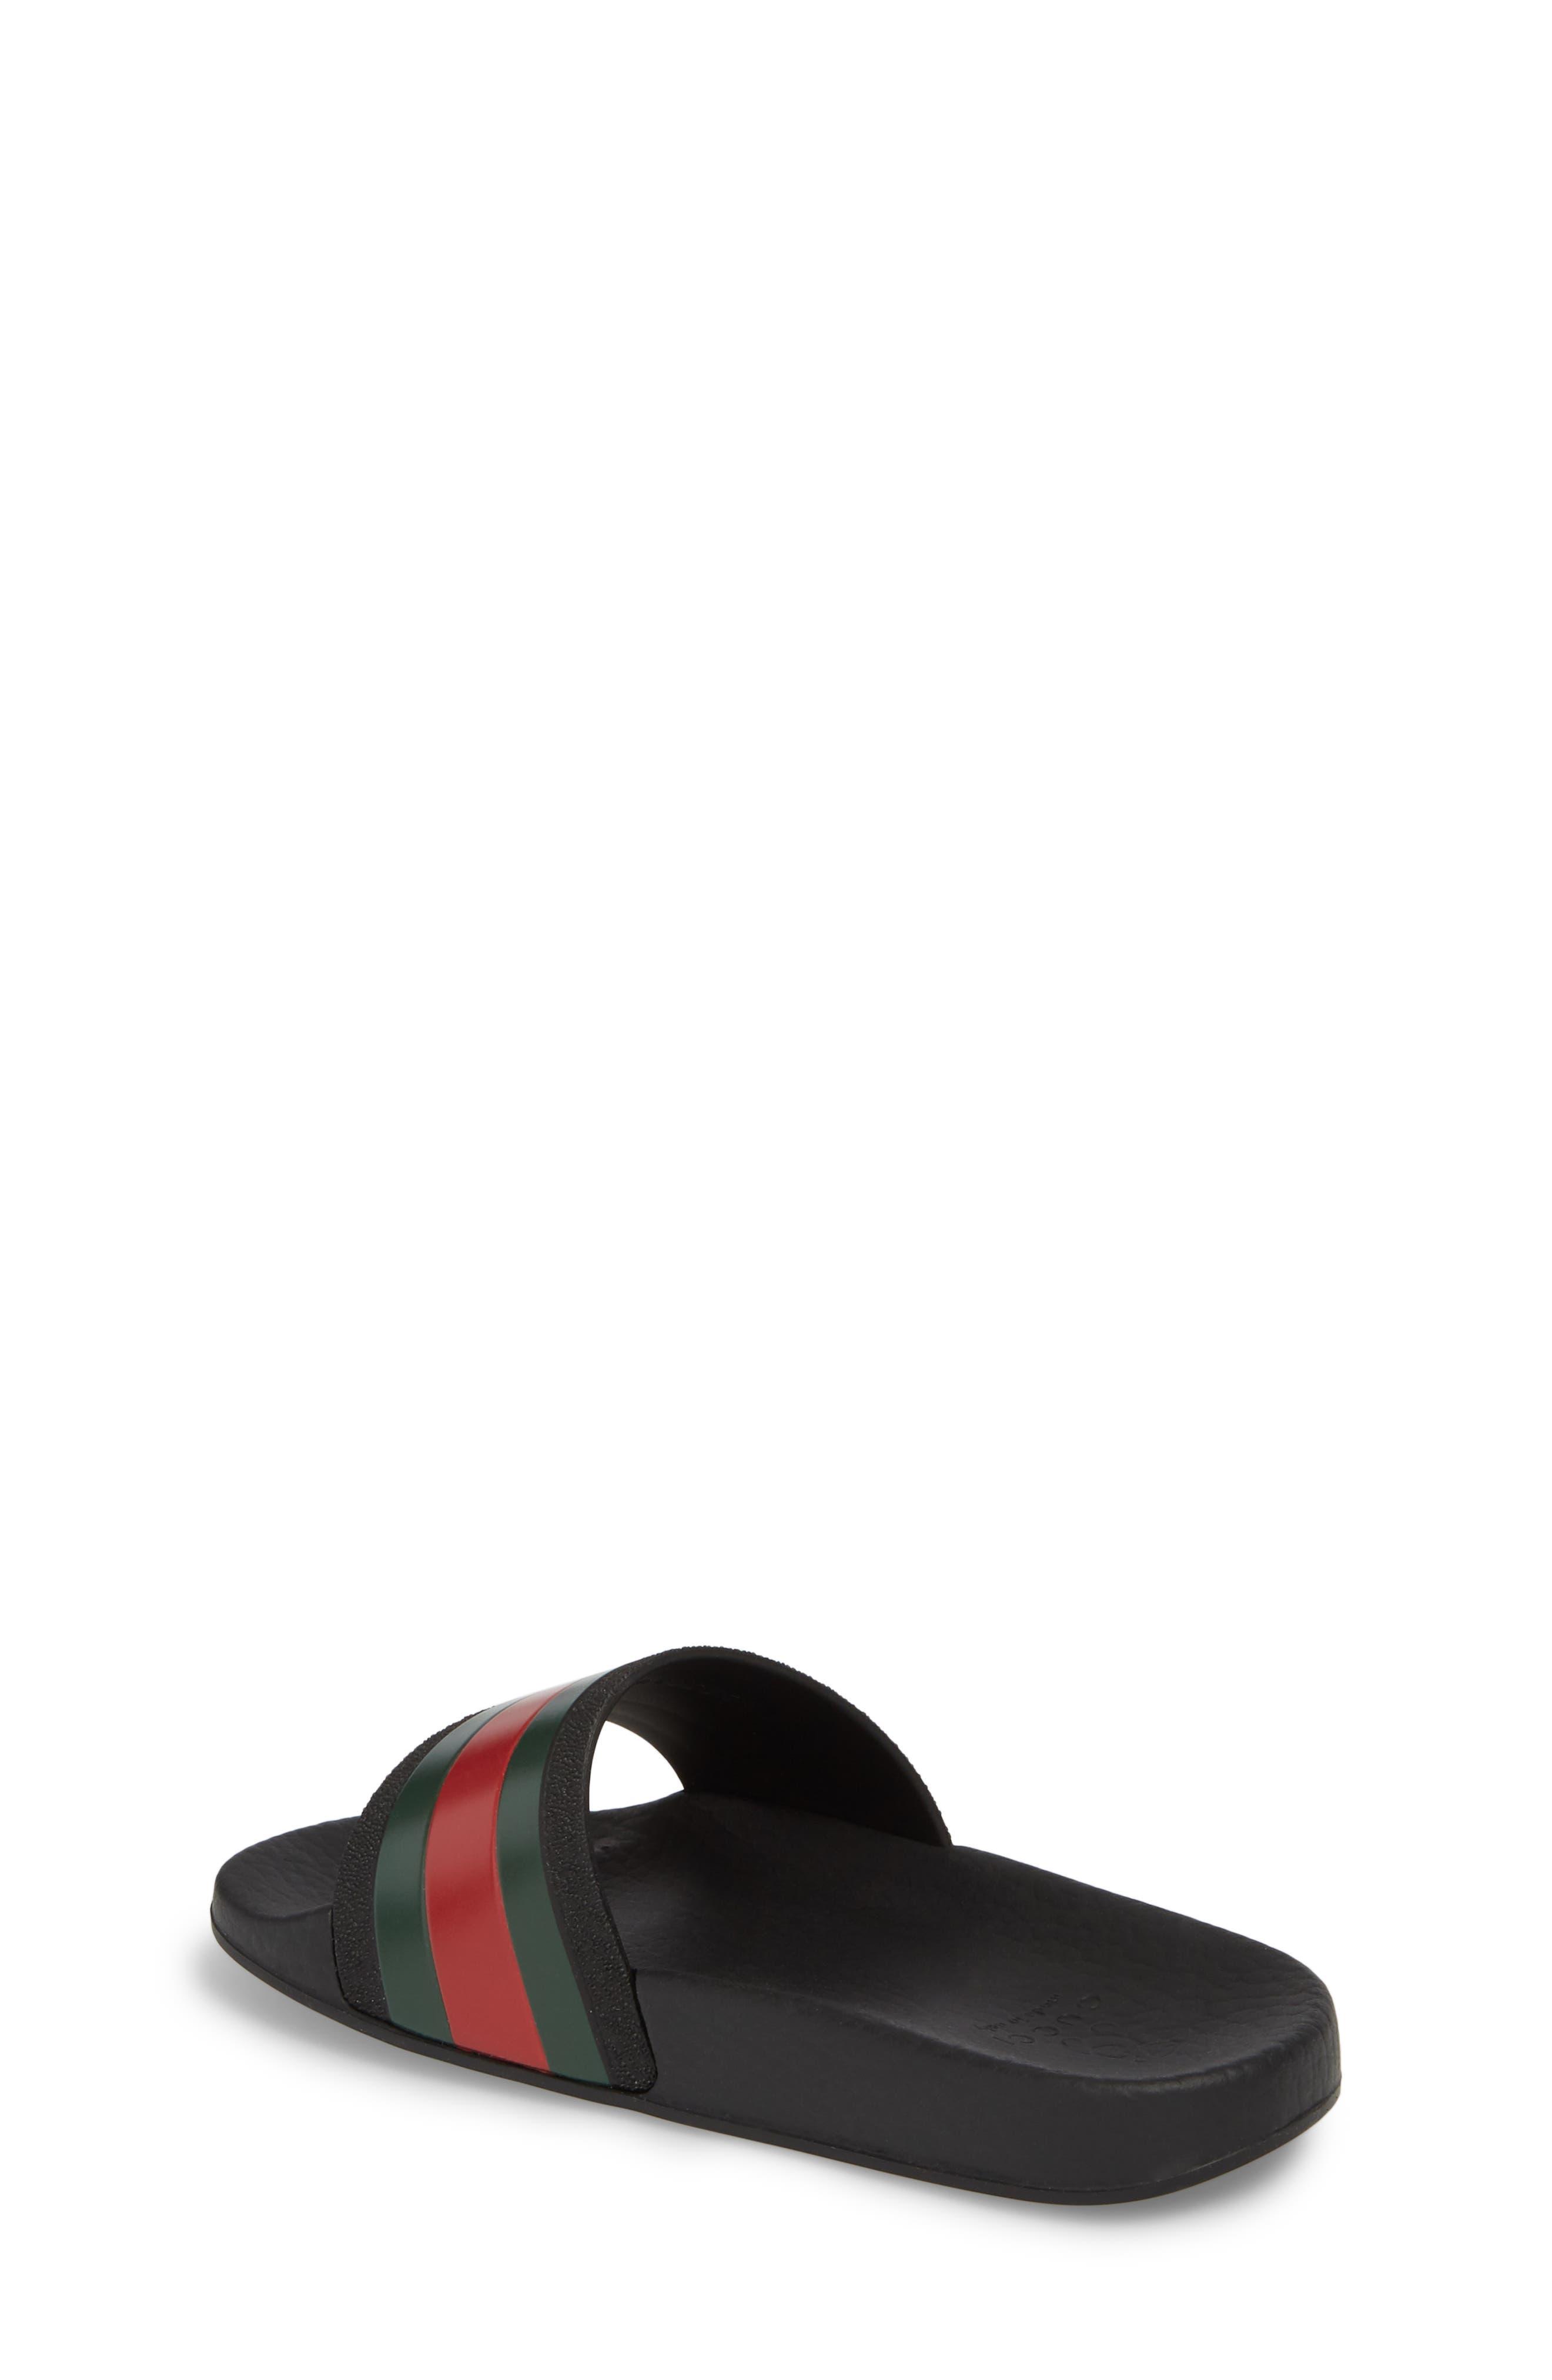 GUCCI, Pursuit Slide Sandal, Alternate thumbnail 2, color, BLACK/ GREEN/ RED